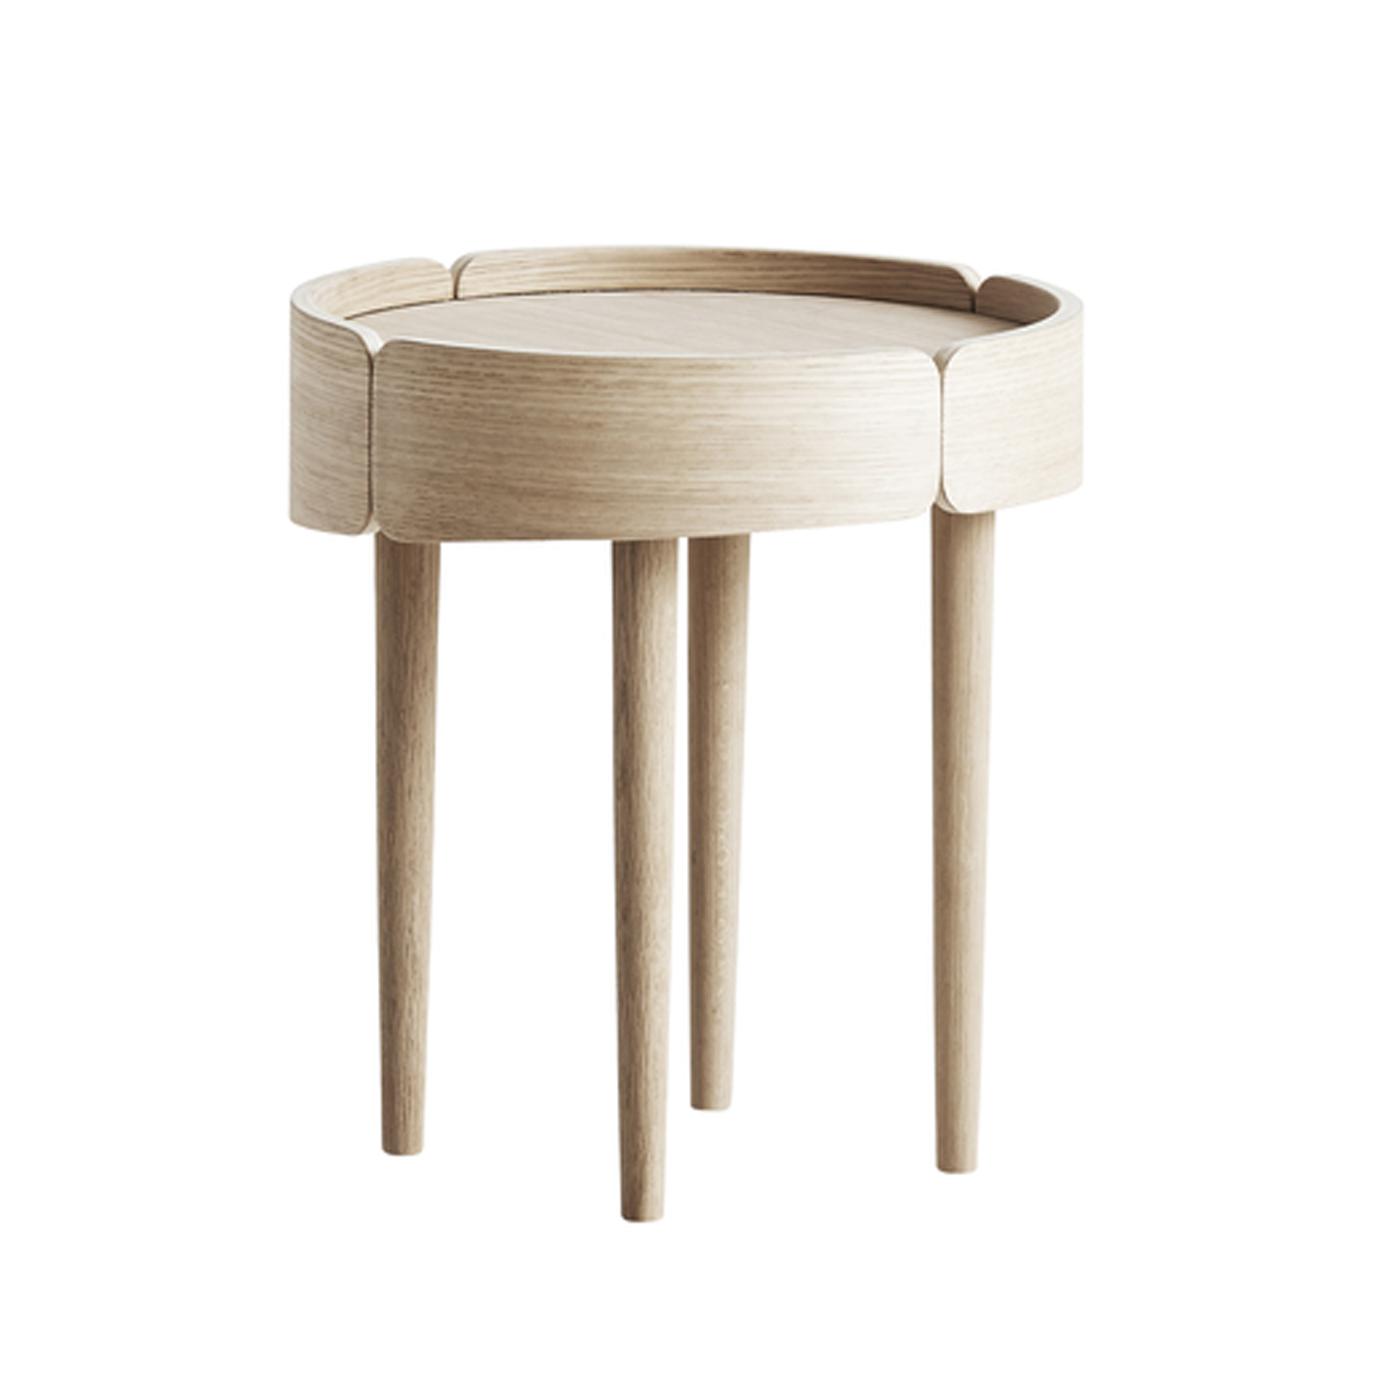 WOUD Skirt lille sofabord - natur egetræsfinér og egetræ, rund (Ø40)